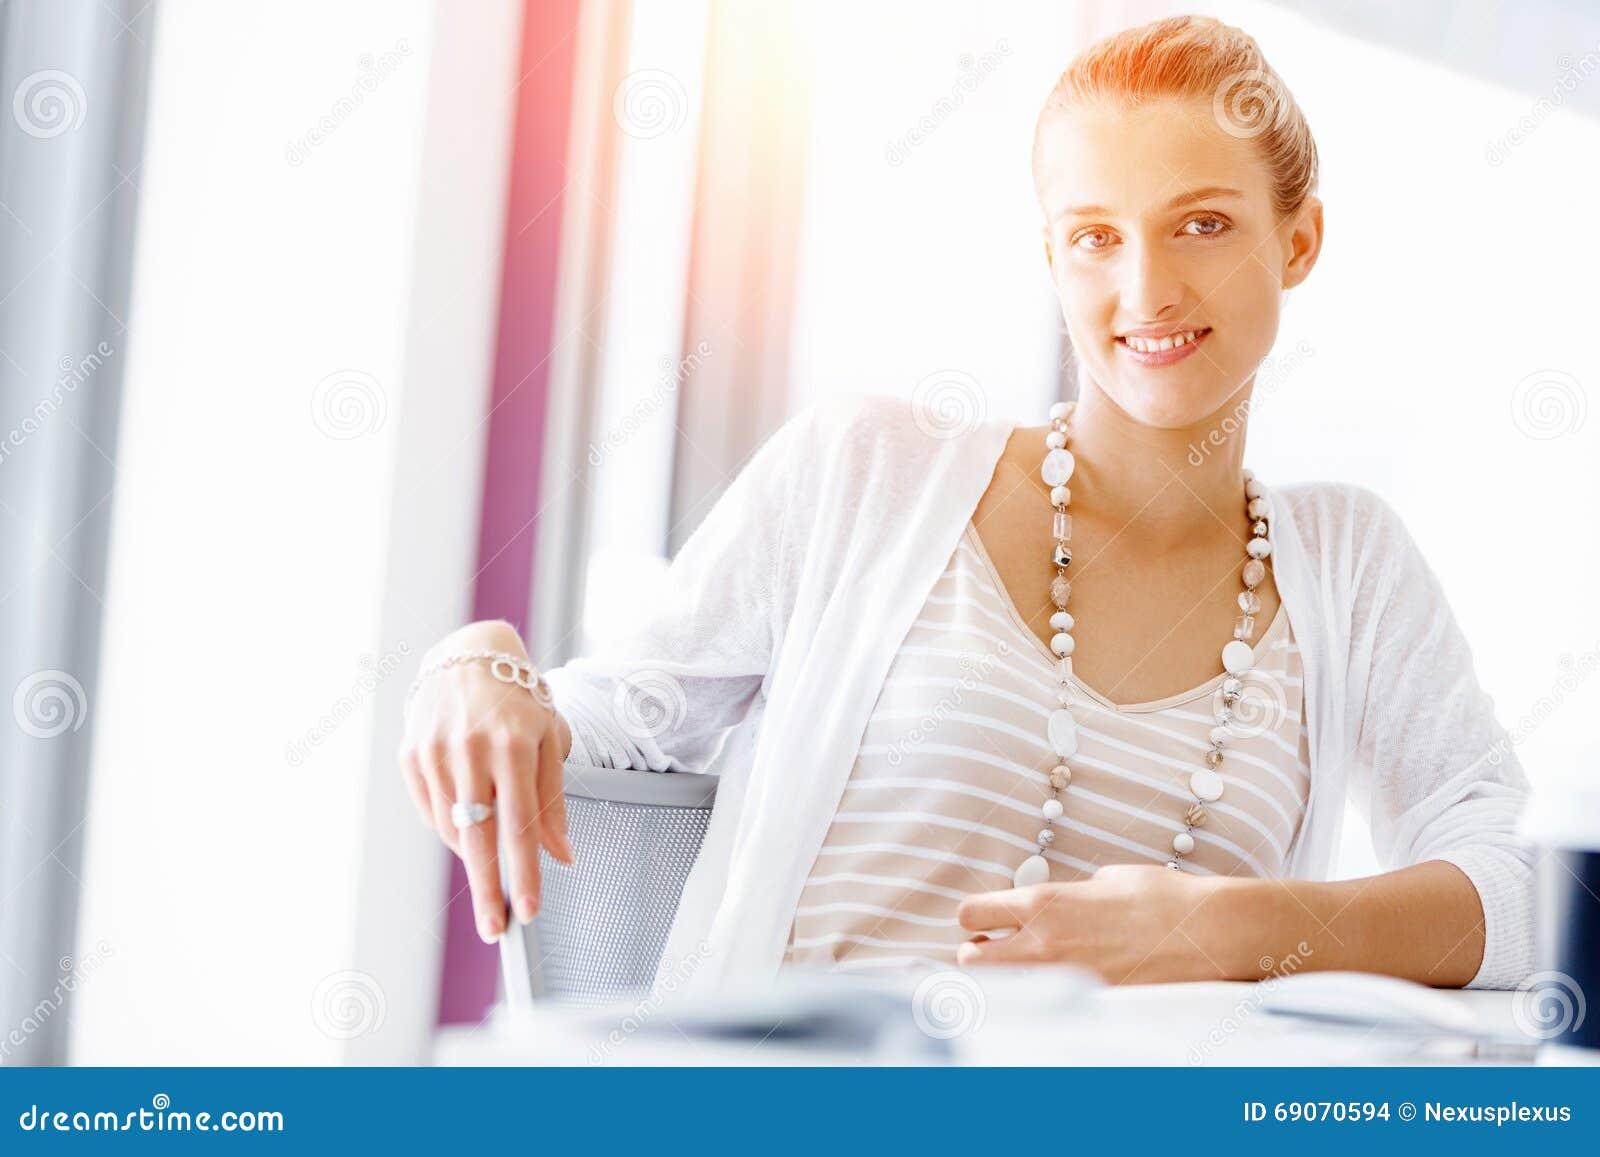 employ de bureau attirant s 39 asseyant au bureau photo stock image 69070594. Black Bedroom Furniture Sets. Home Design Ideas